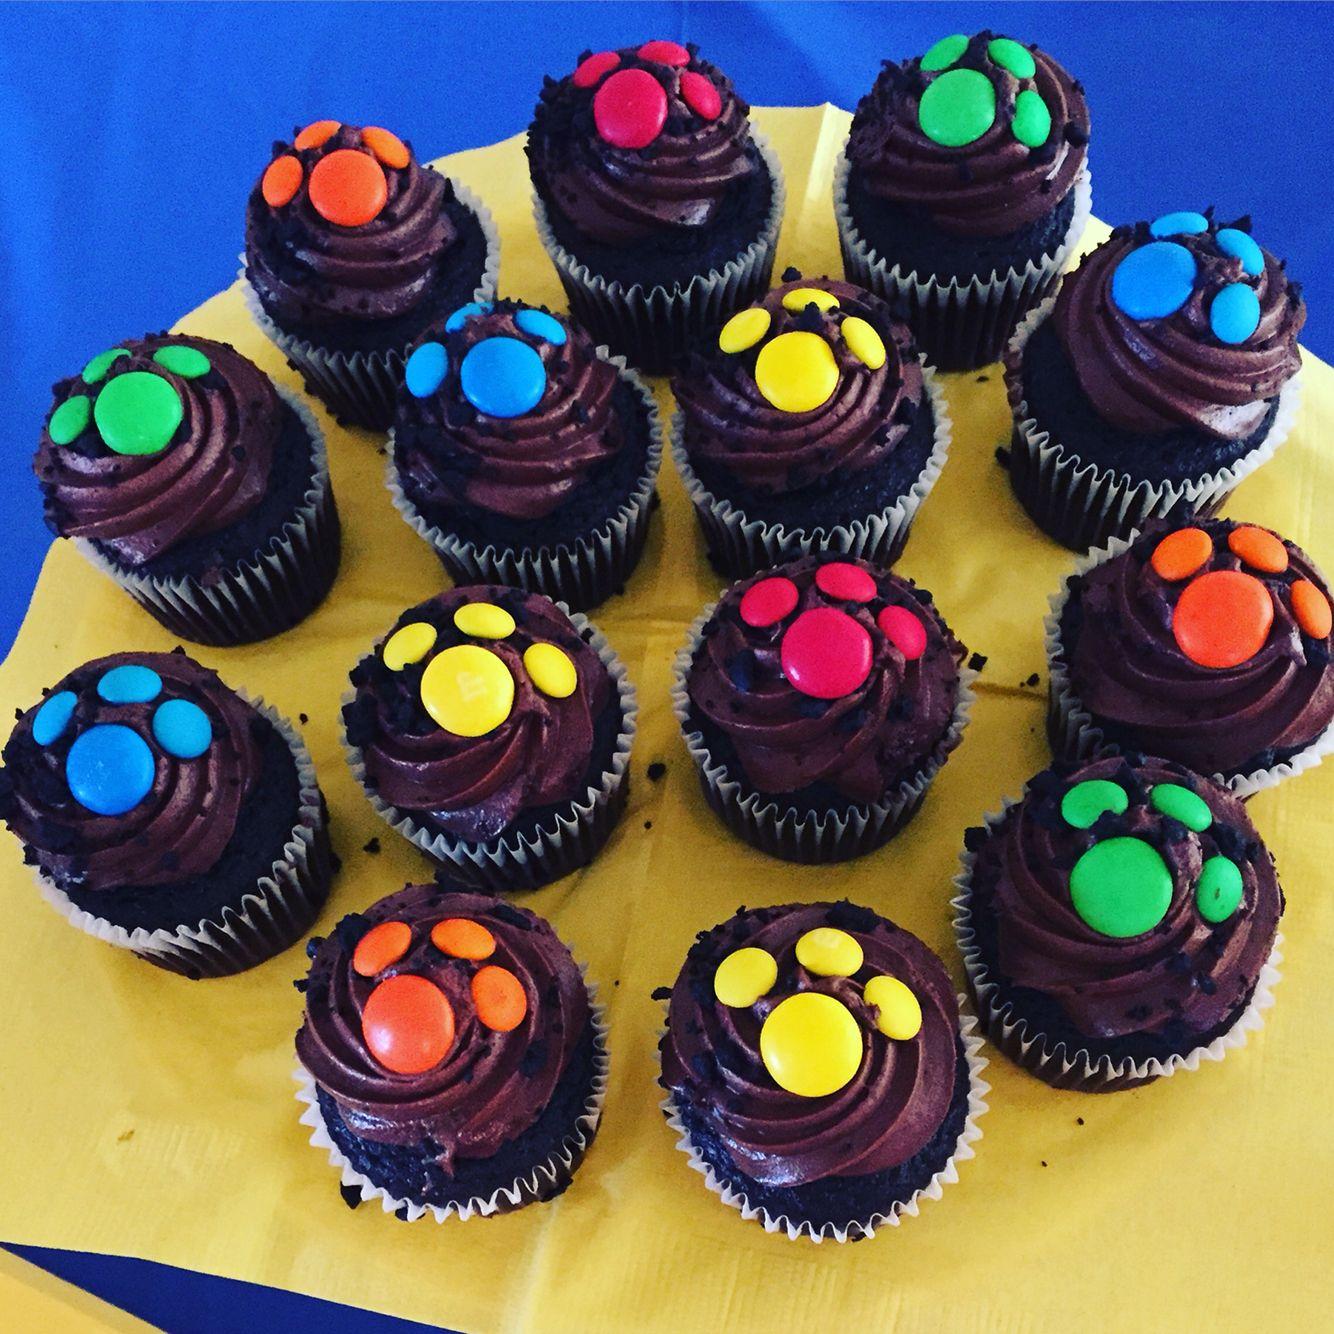 Easy paw patrol mini cupcakes Paw Patrol Toys Pinterest Paw